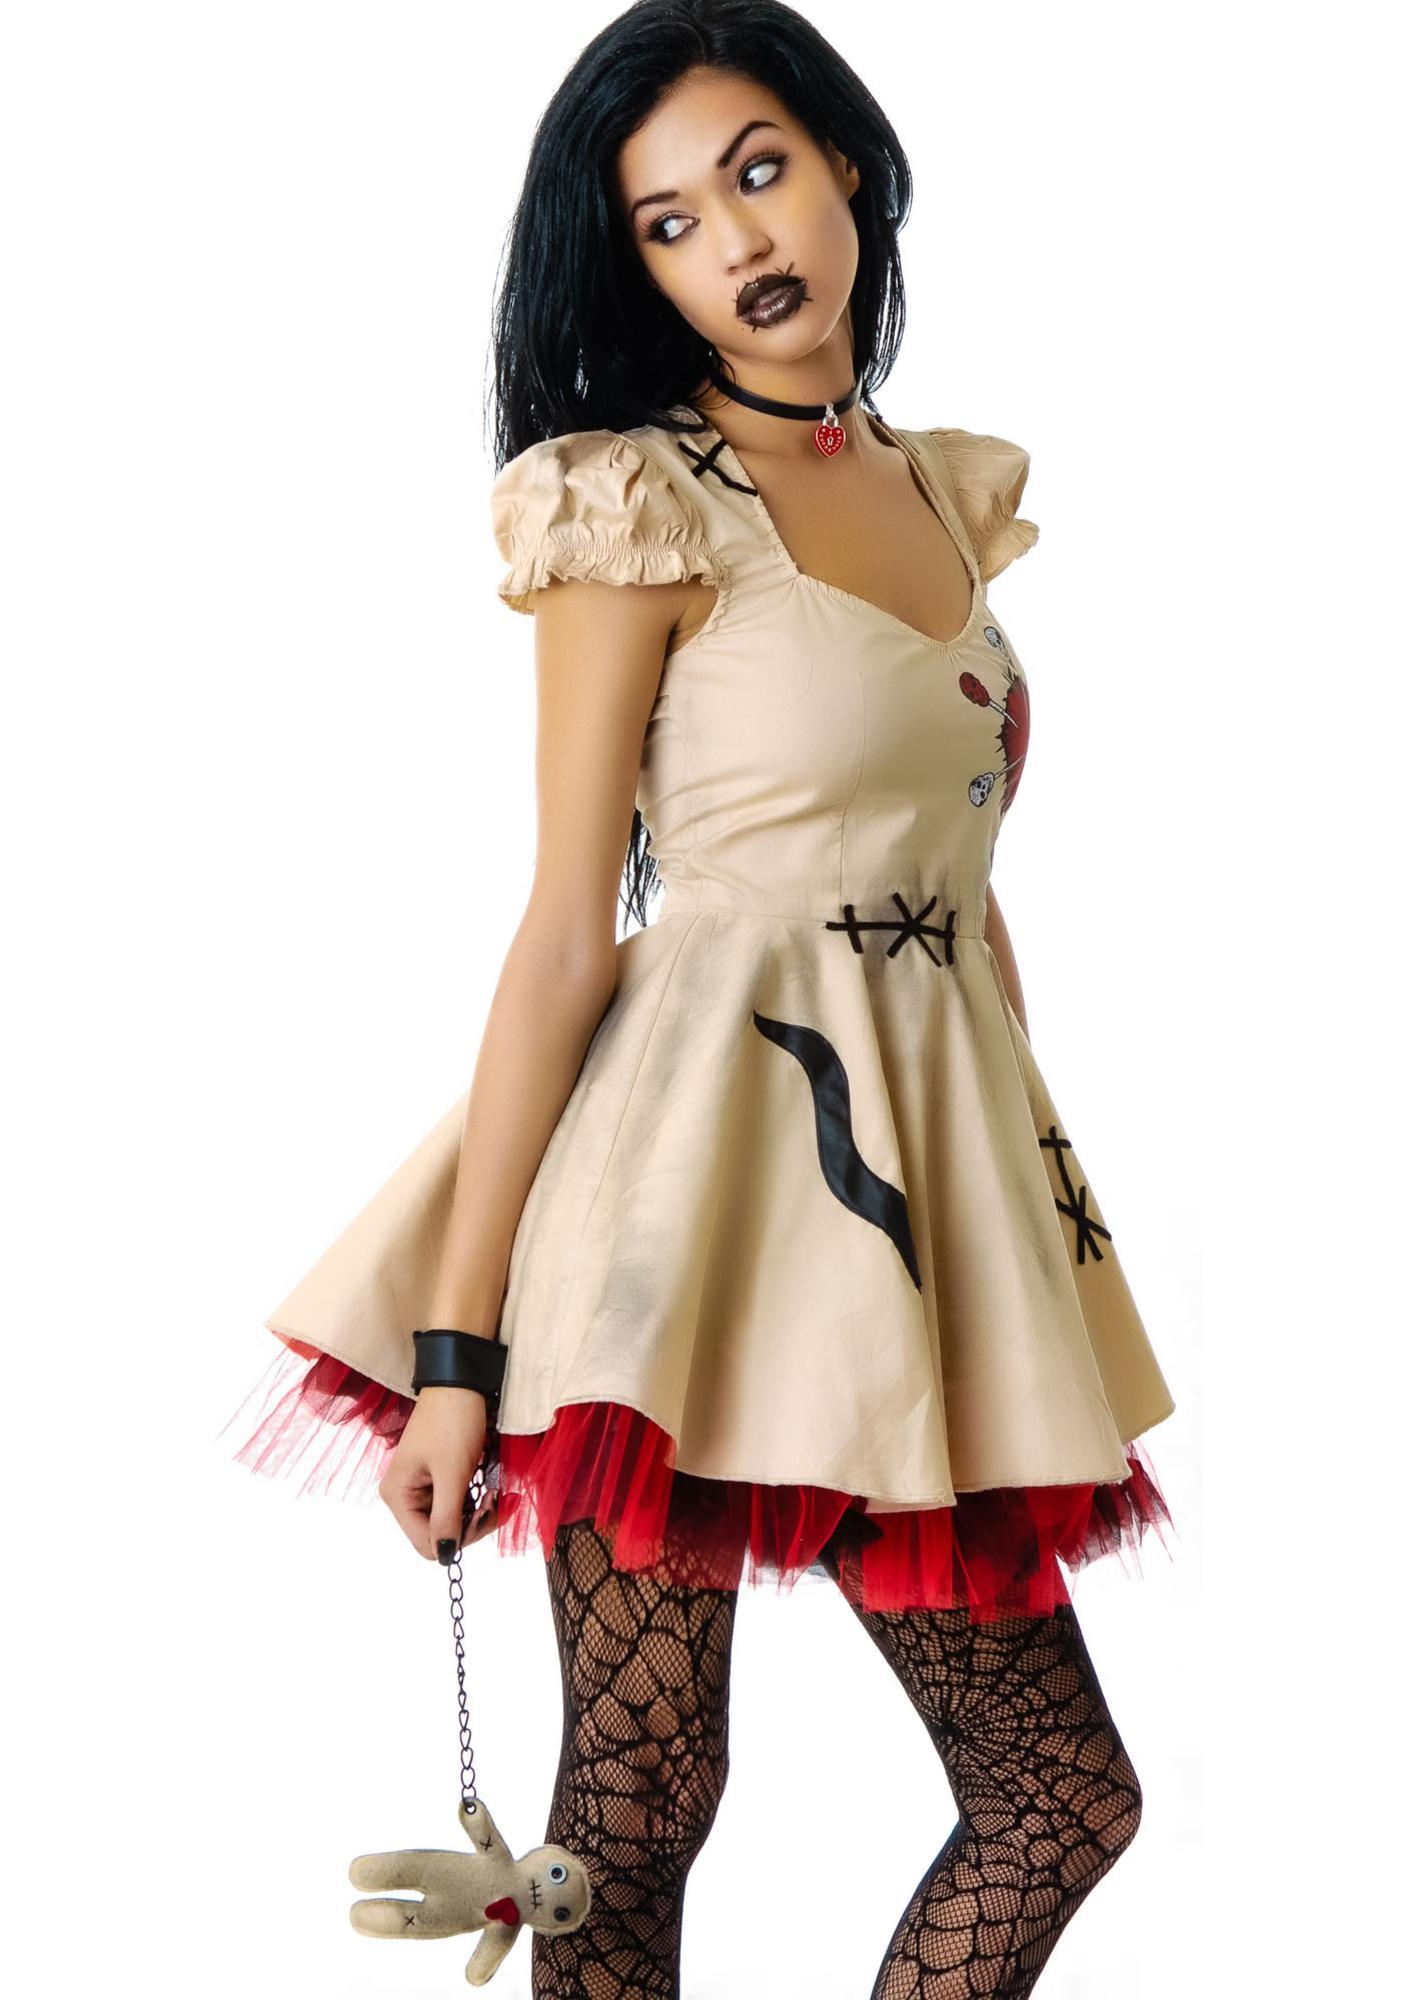 black voodoo doll costume - photo #2